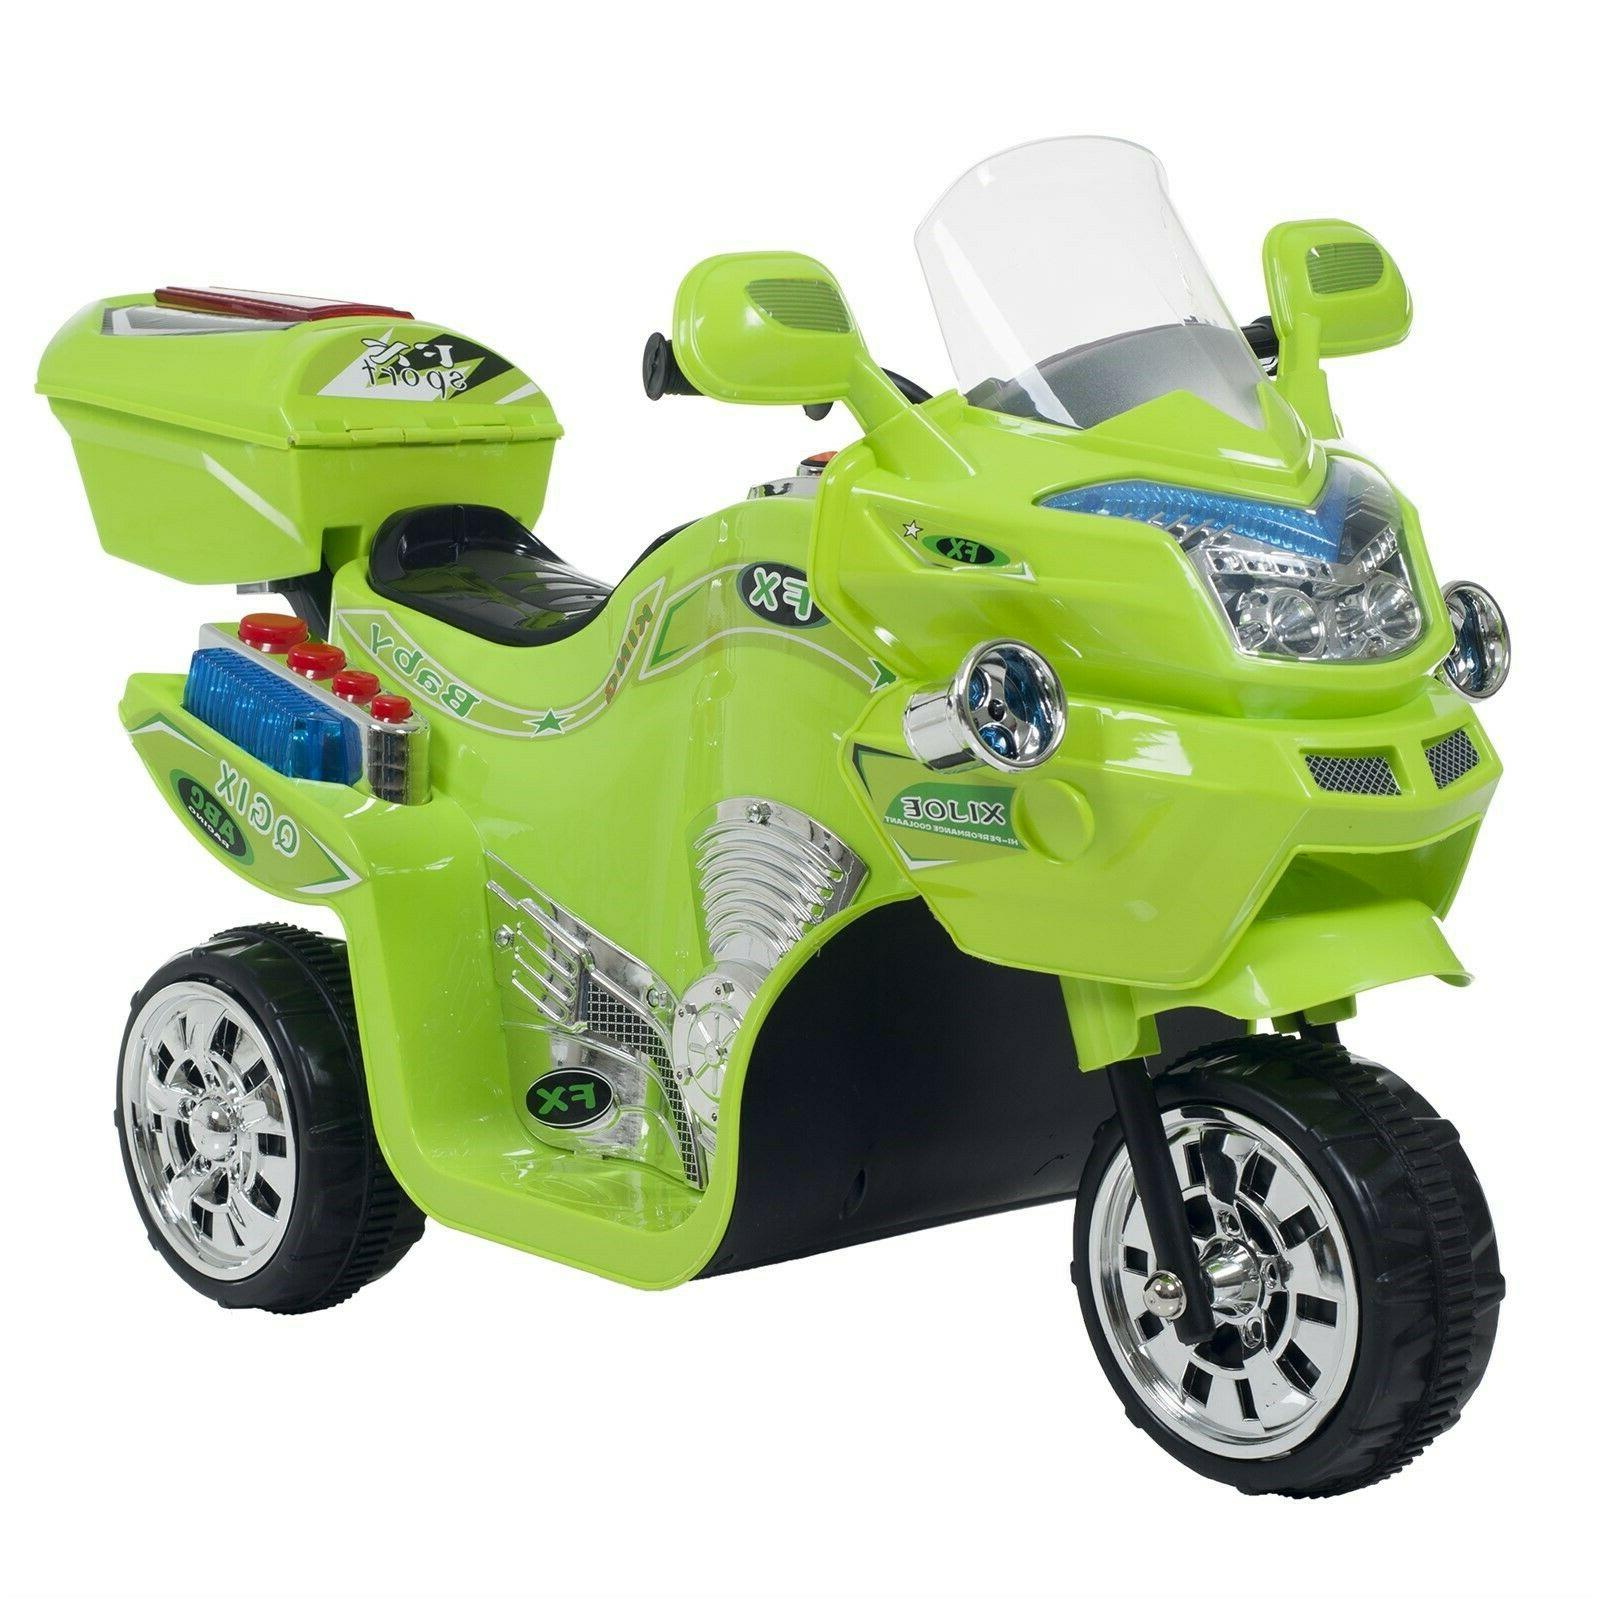 NEW Lil' Rider 3 Wheel Battery Powered FX Sport Bike - Green